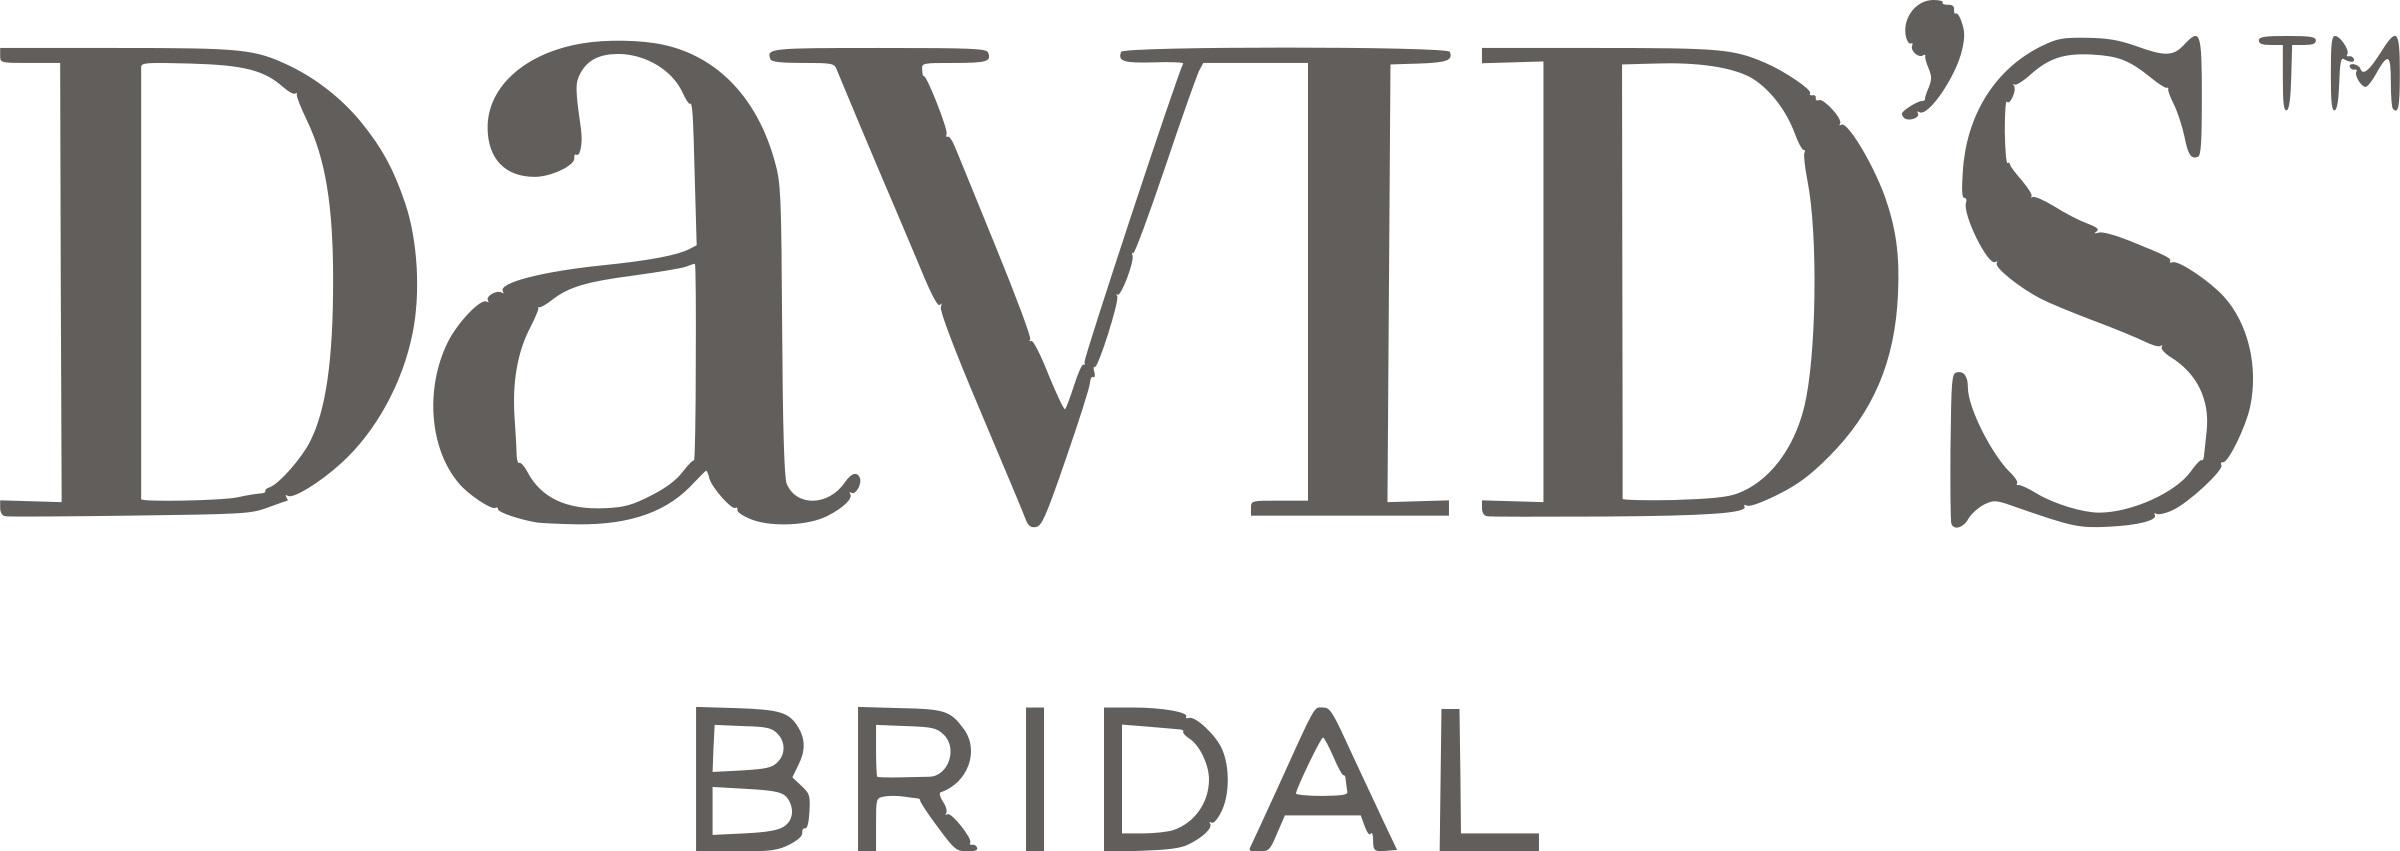 davids-bridal-1-logo-png-transparent.jpg